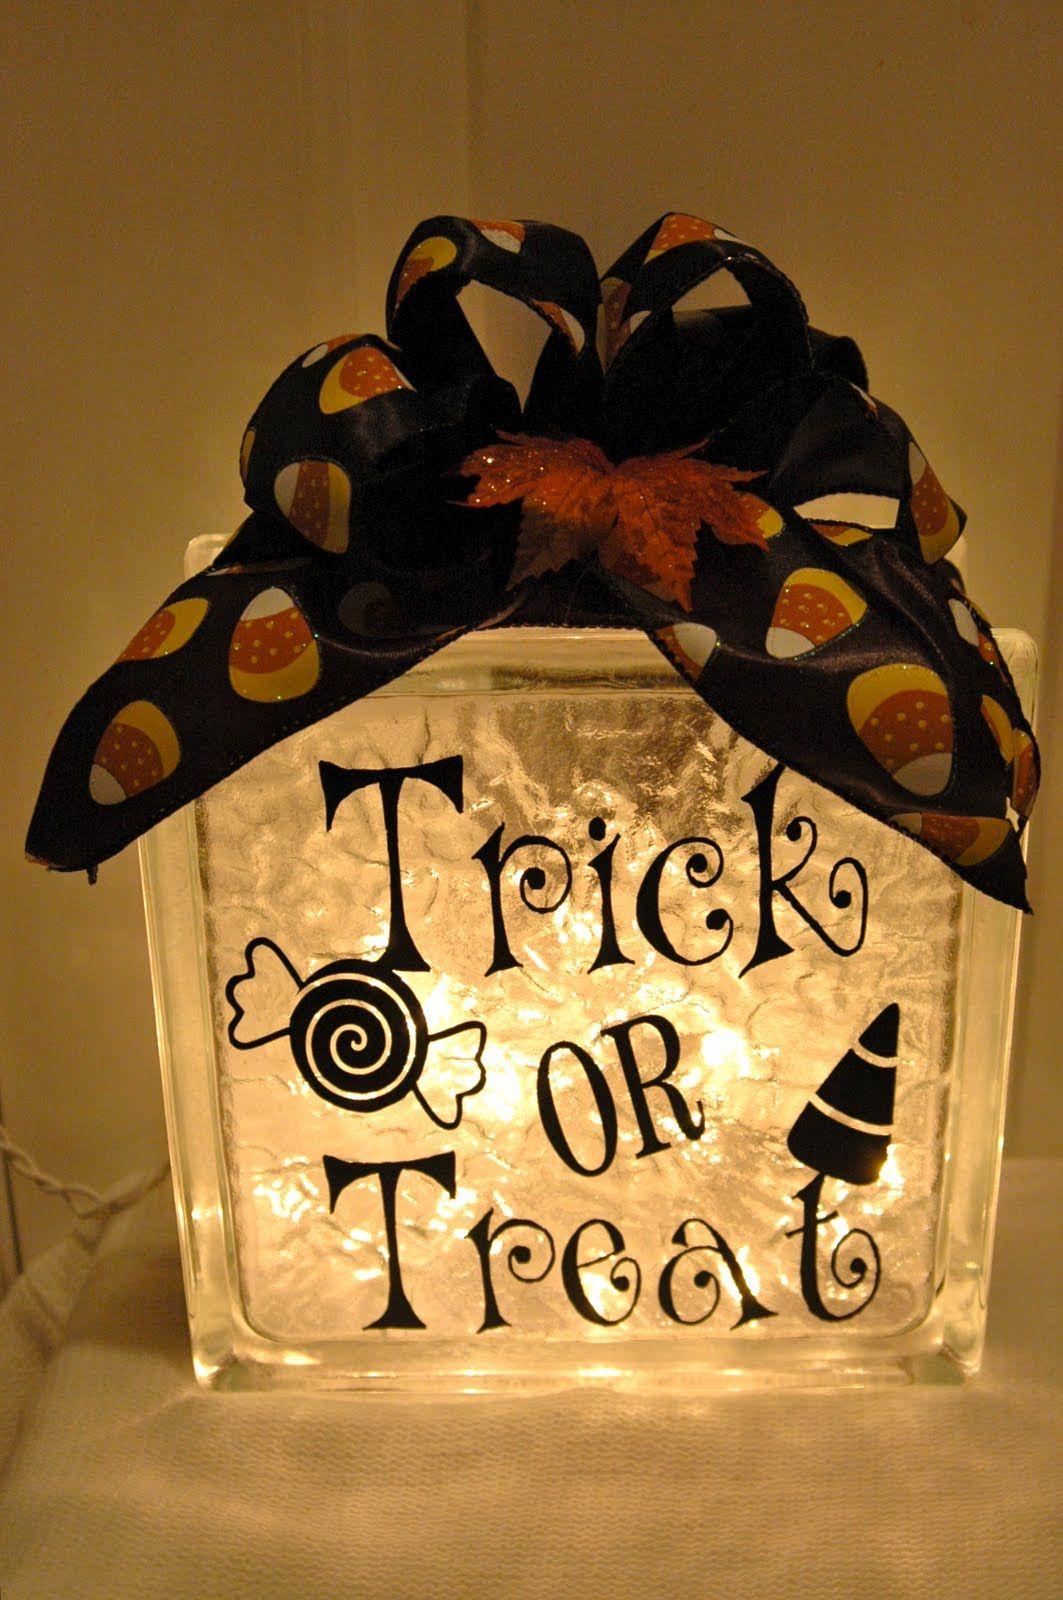 Halloween Decals Stickers For Glass Block Holiday Decoration - Halloween vinyl decals for glass blocks